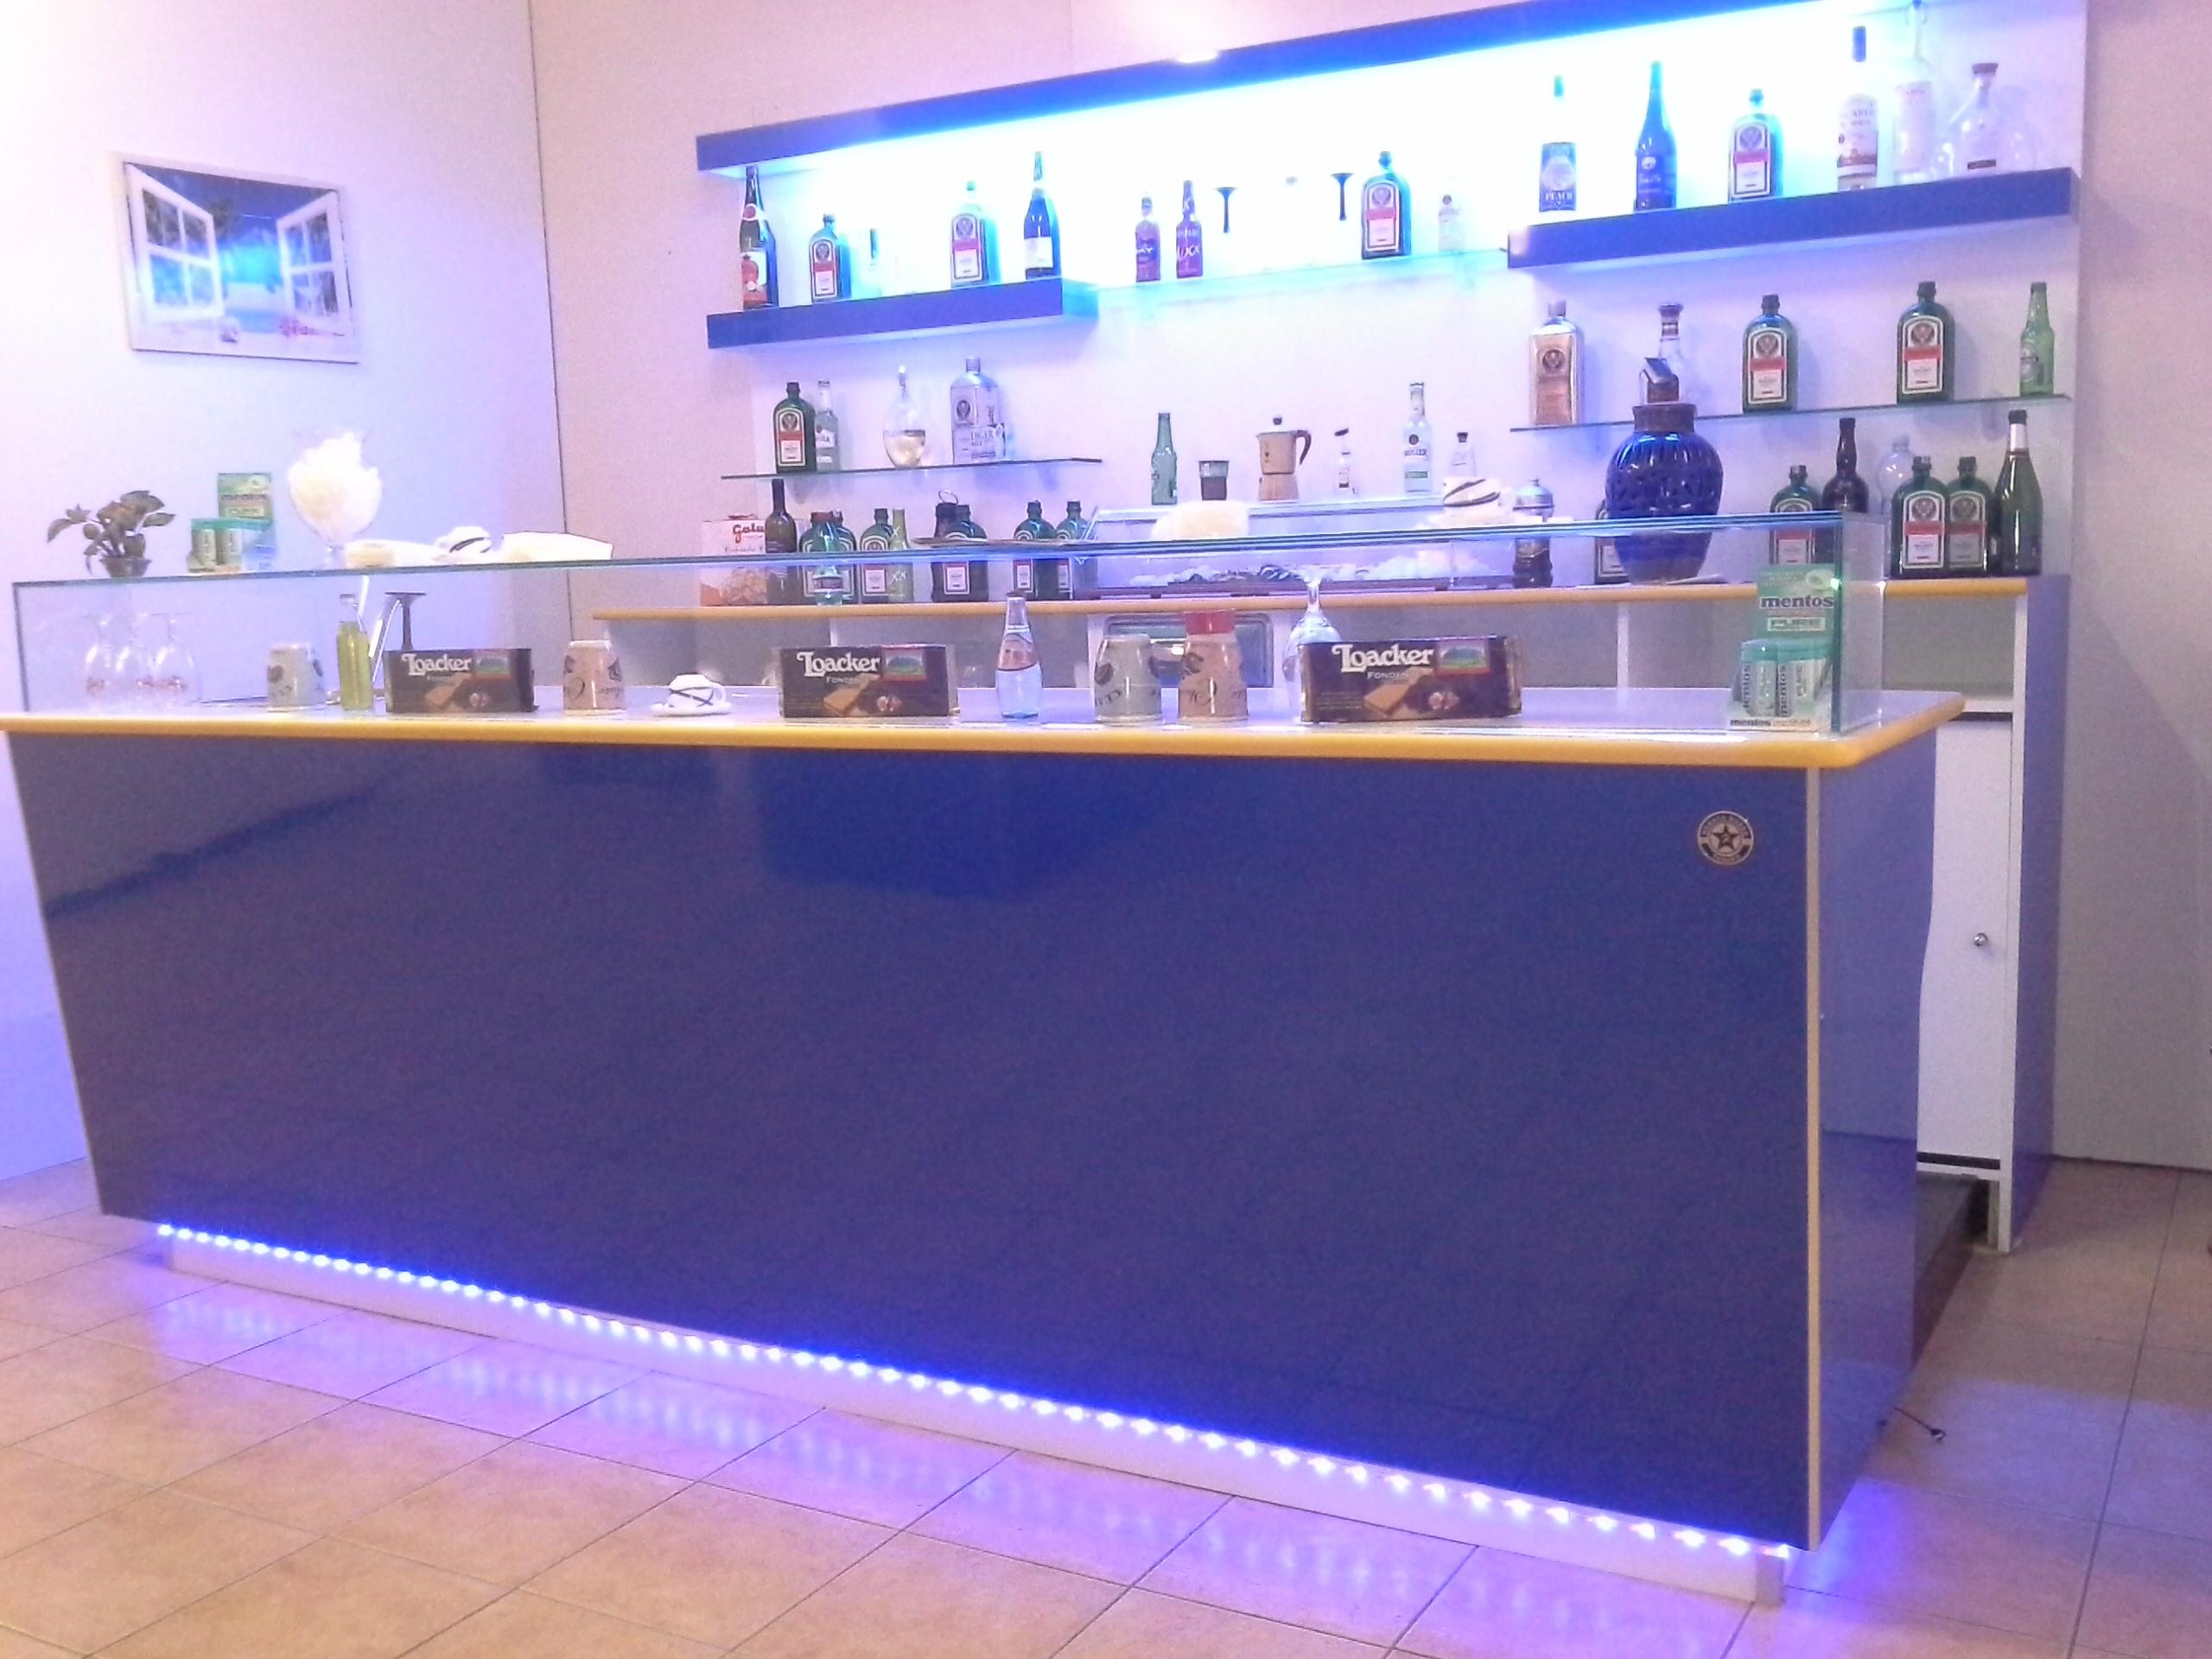 Banchi bar prezzi banchi bar banconi bar banchi frigo for Banconi bar milano